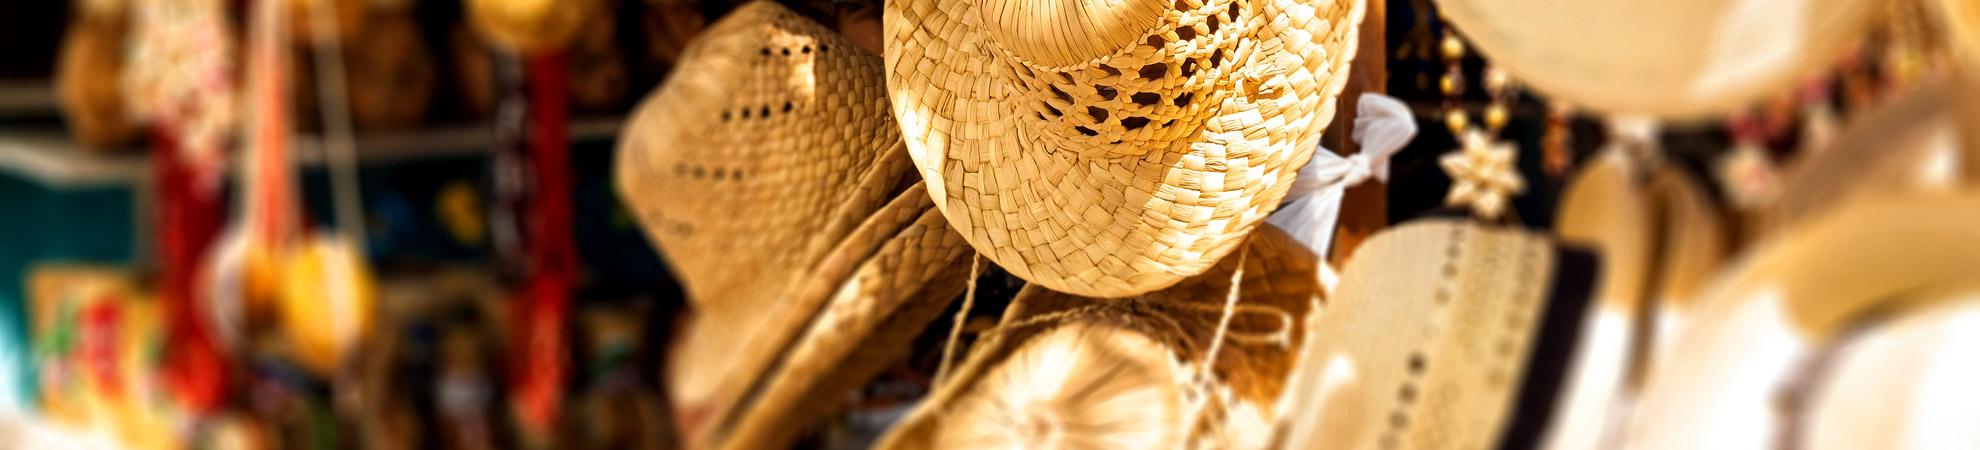 A ramener de Cuba : des produits artisanaux